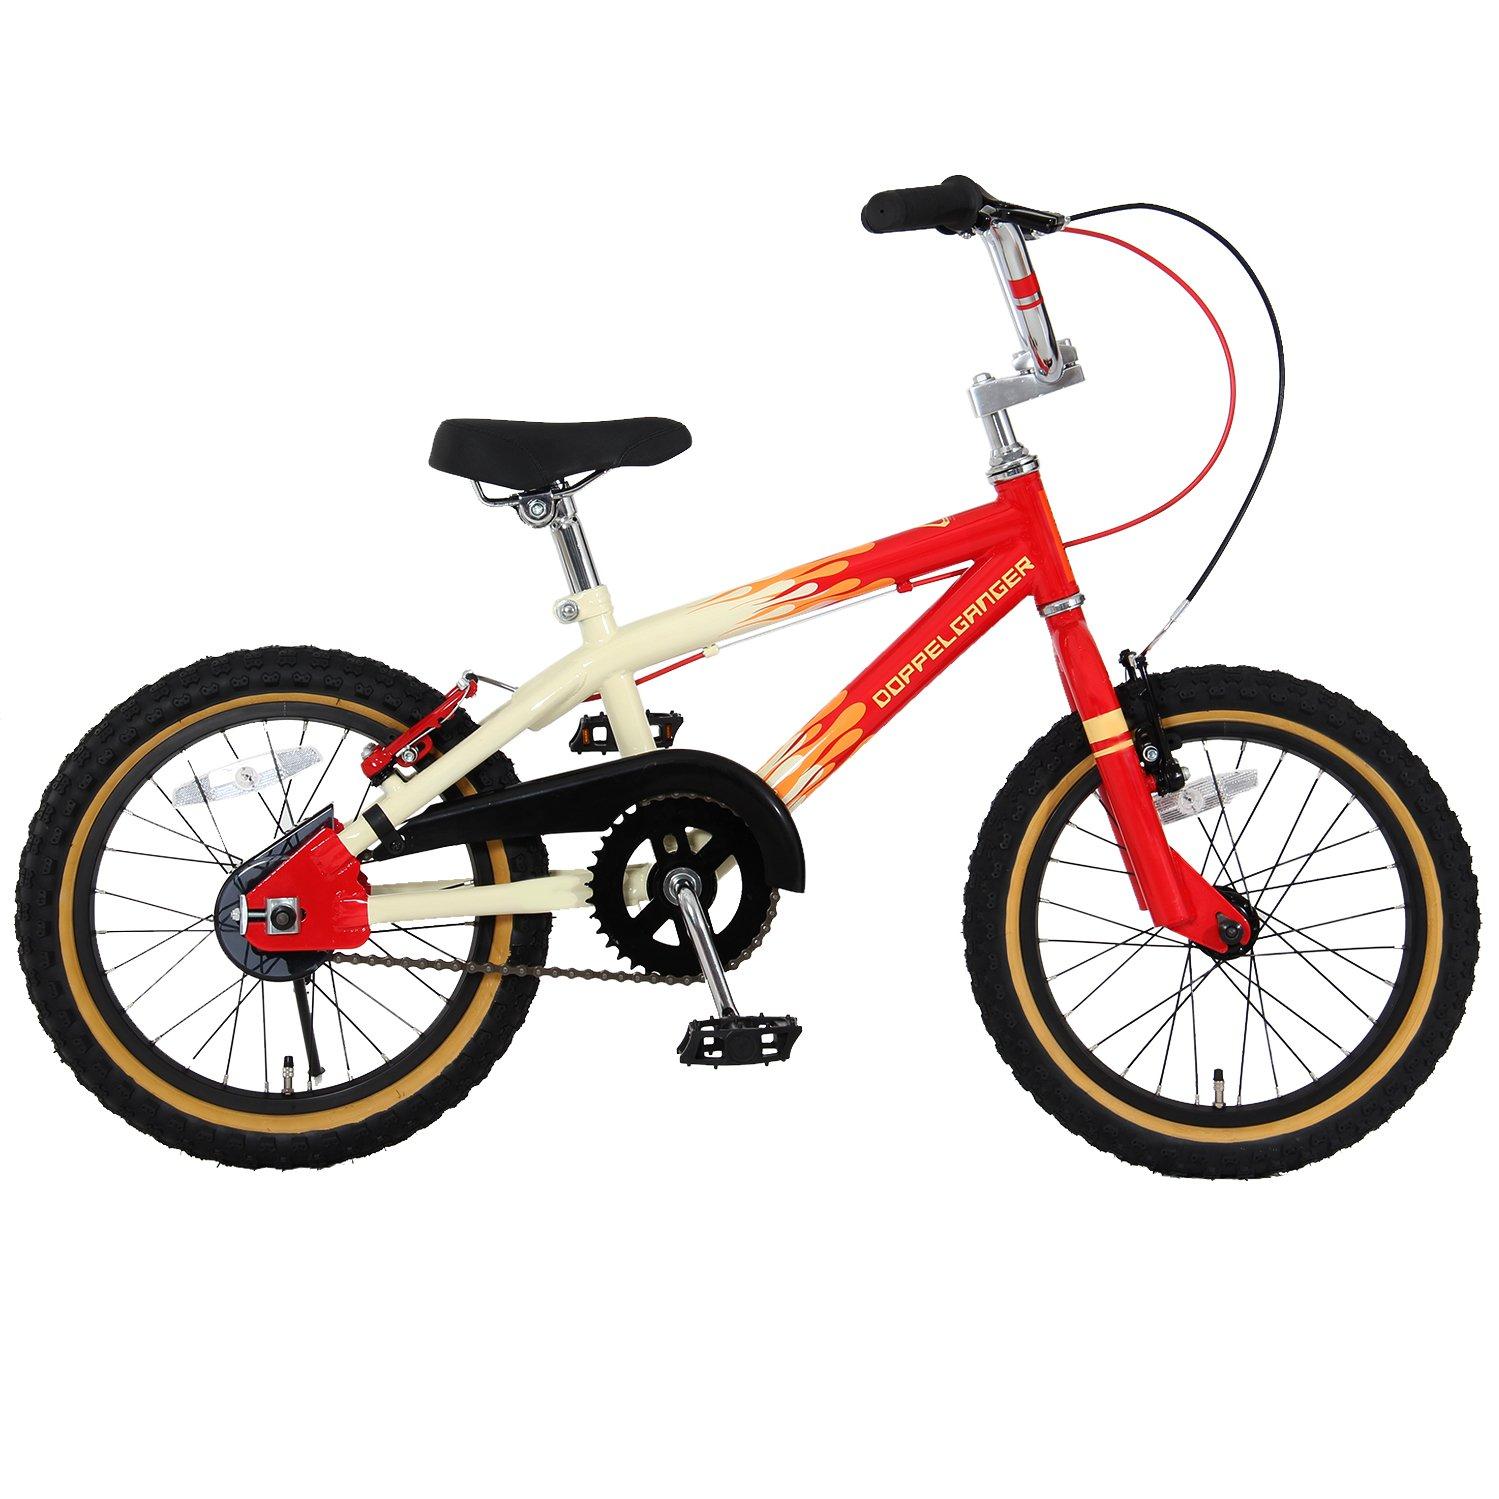 DOPPELGANGER(ドッペルギャンガー) 16インチ子ども用自転車 [付け替えできる補助輪/スタンド付属] 前後V型ブレーキ [適応身長目安:110cm~] ファイヤパターン DXR16-FR ホワイト B07591Y8ZM